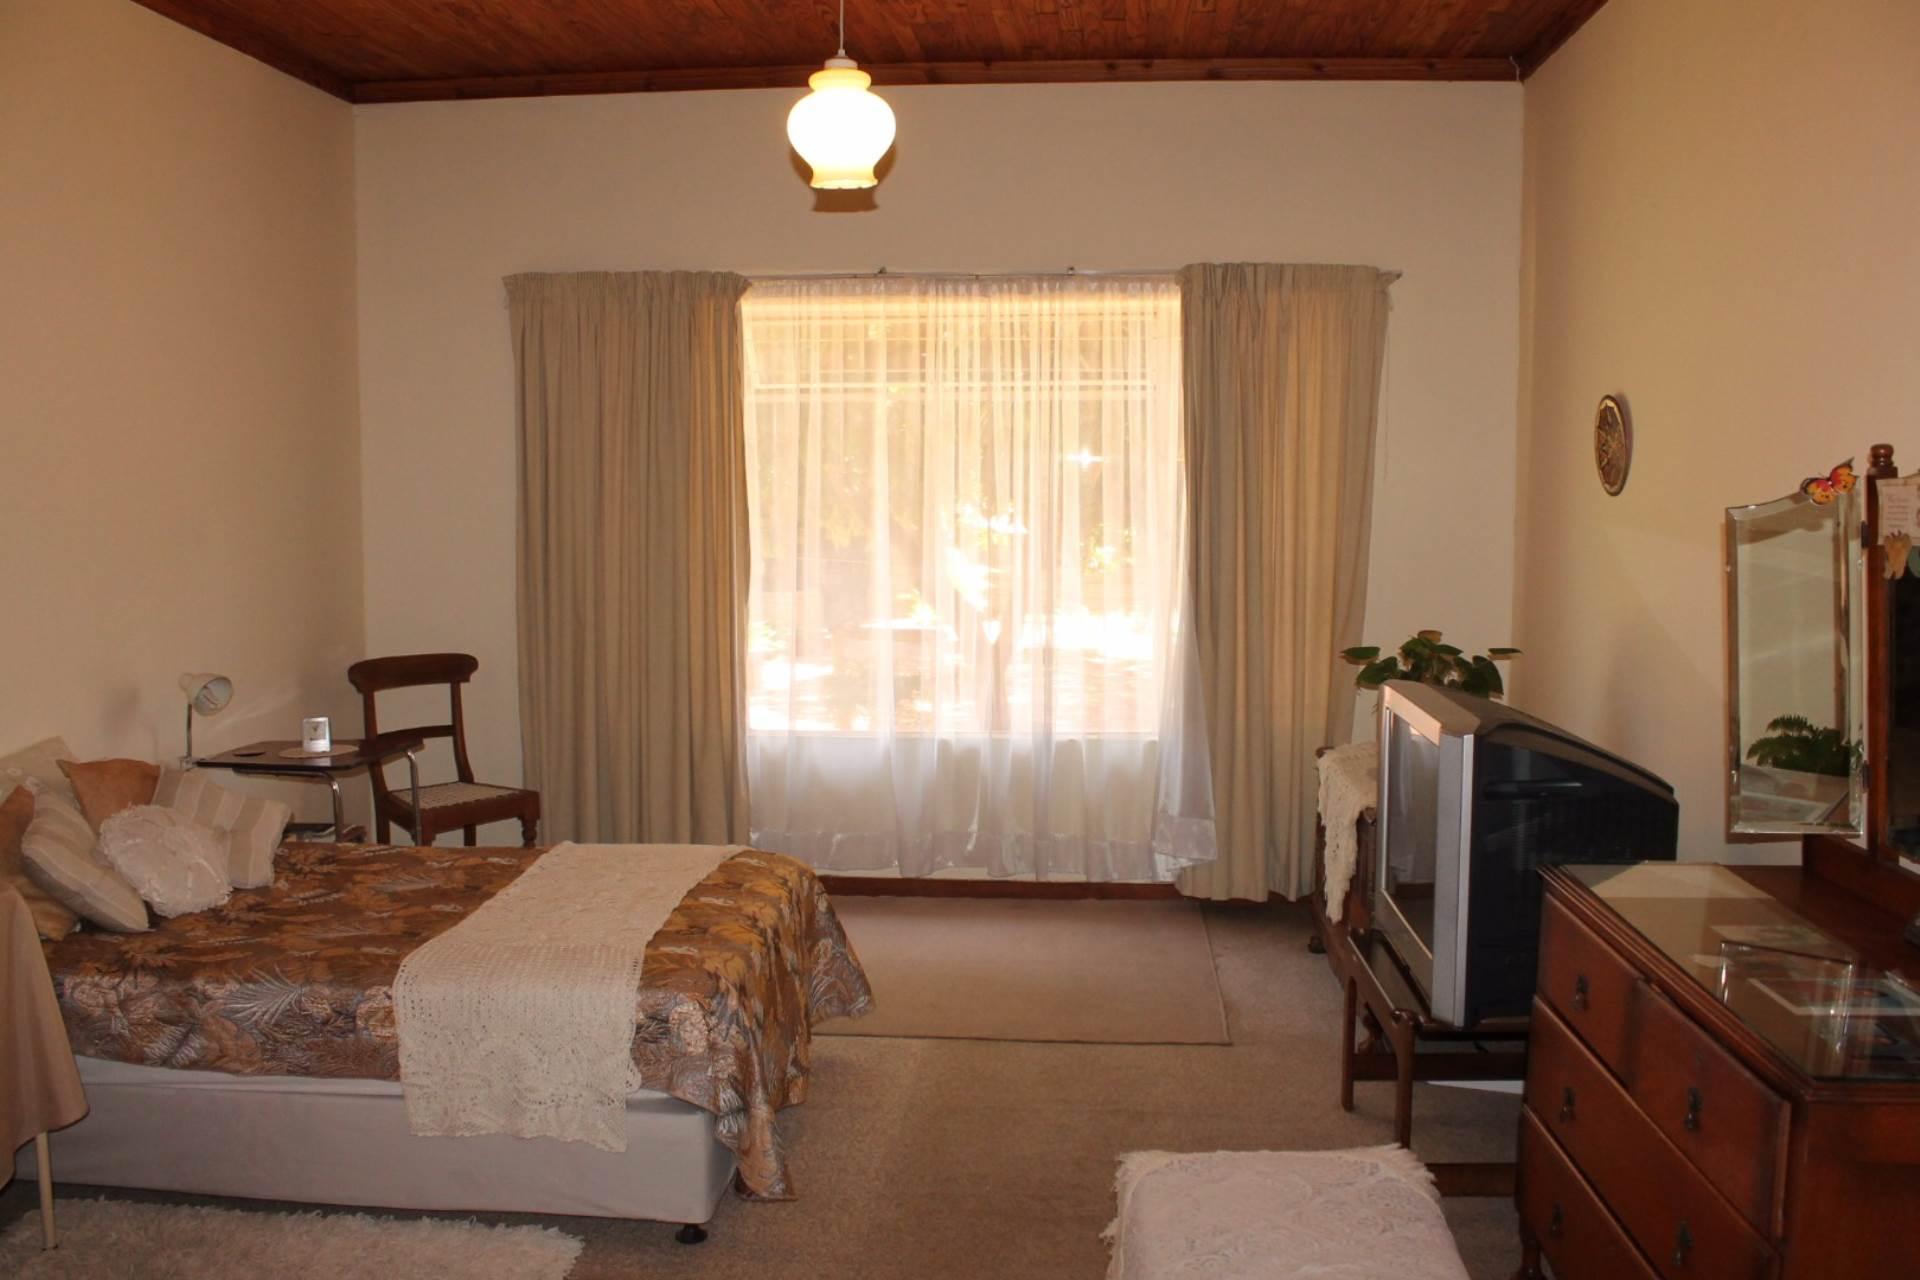 Amandasig property for sale. Ref No: 13552875. Picture no 9